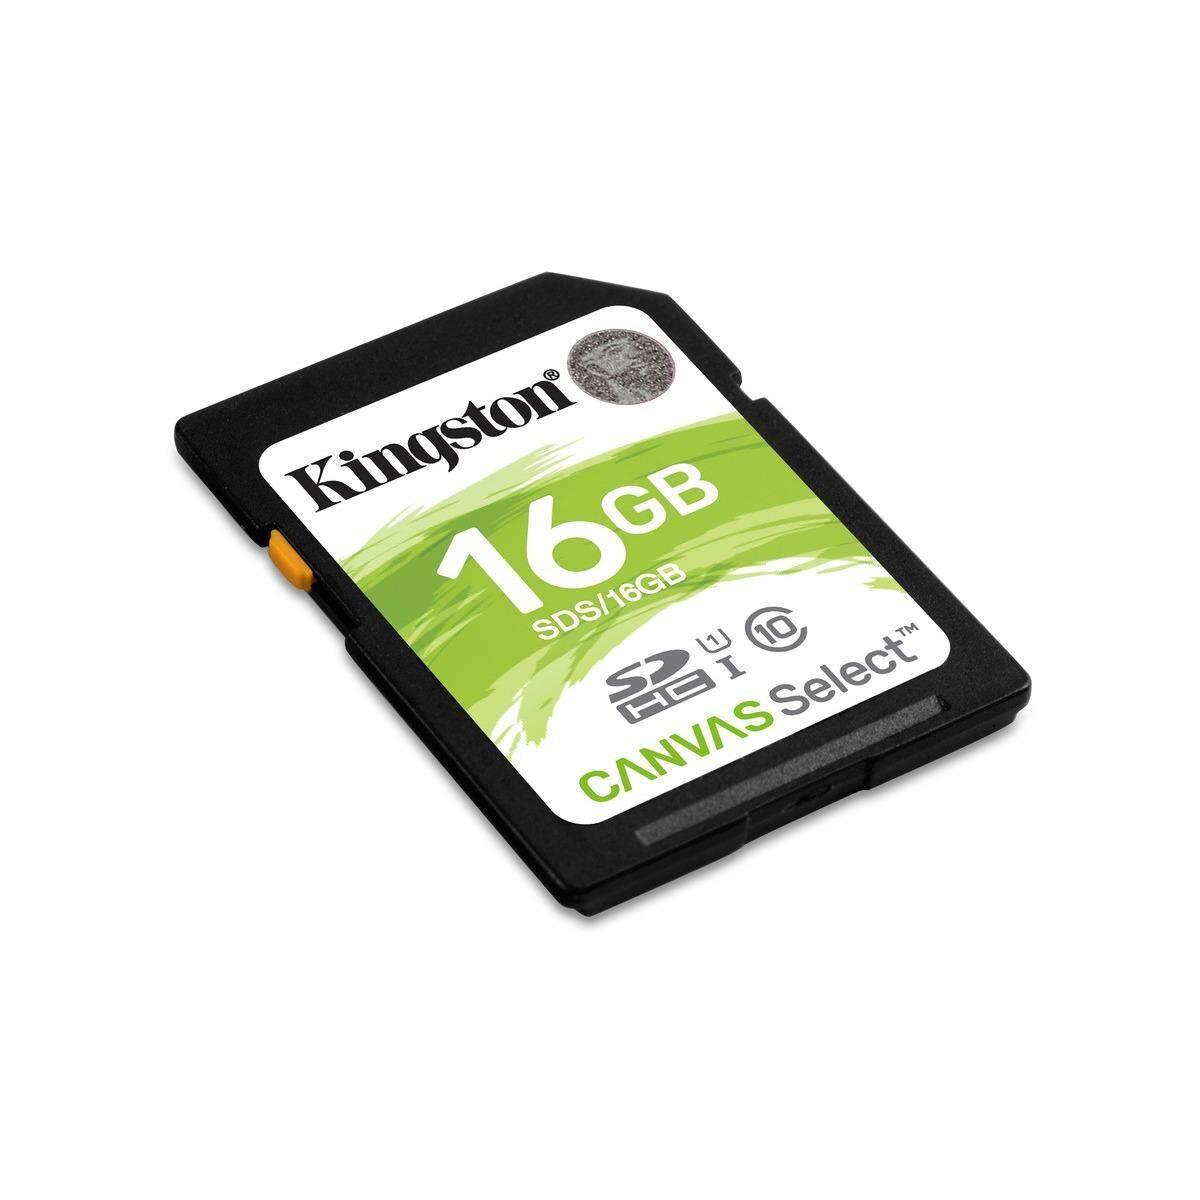 Cek Harga Kingston Canvas Select 16gb Class 10 Uhs I Microsdhc Sdxc Sandisk Micro Sd New 48 Mb S Ultra 1 Sdsqunb Gambar Product Lengkap Memory Card Sds Terbaru